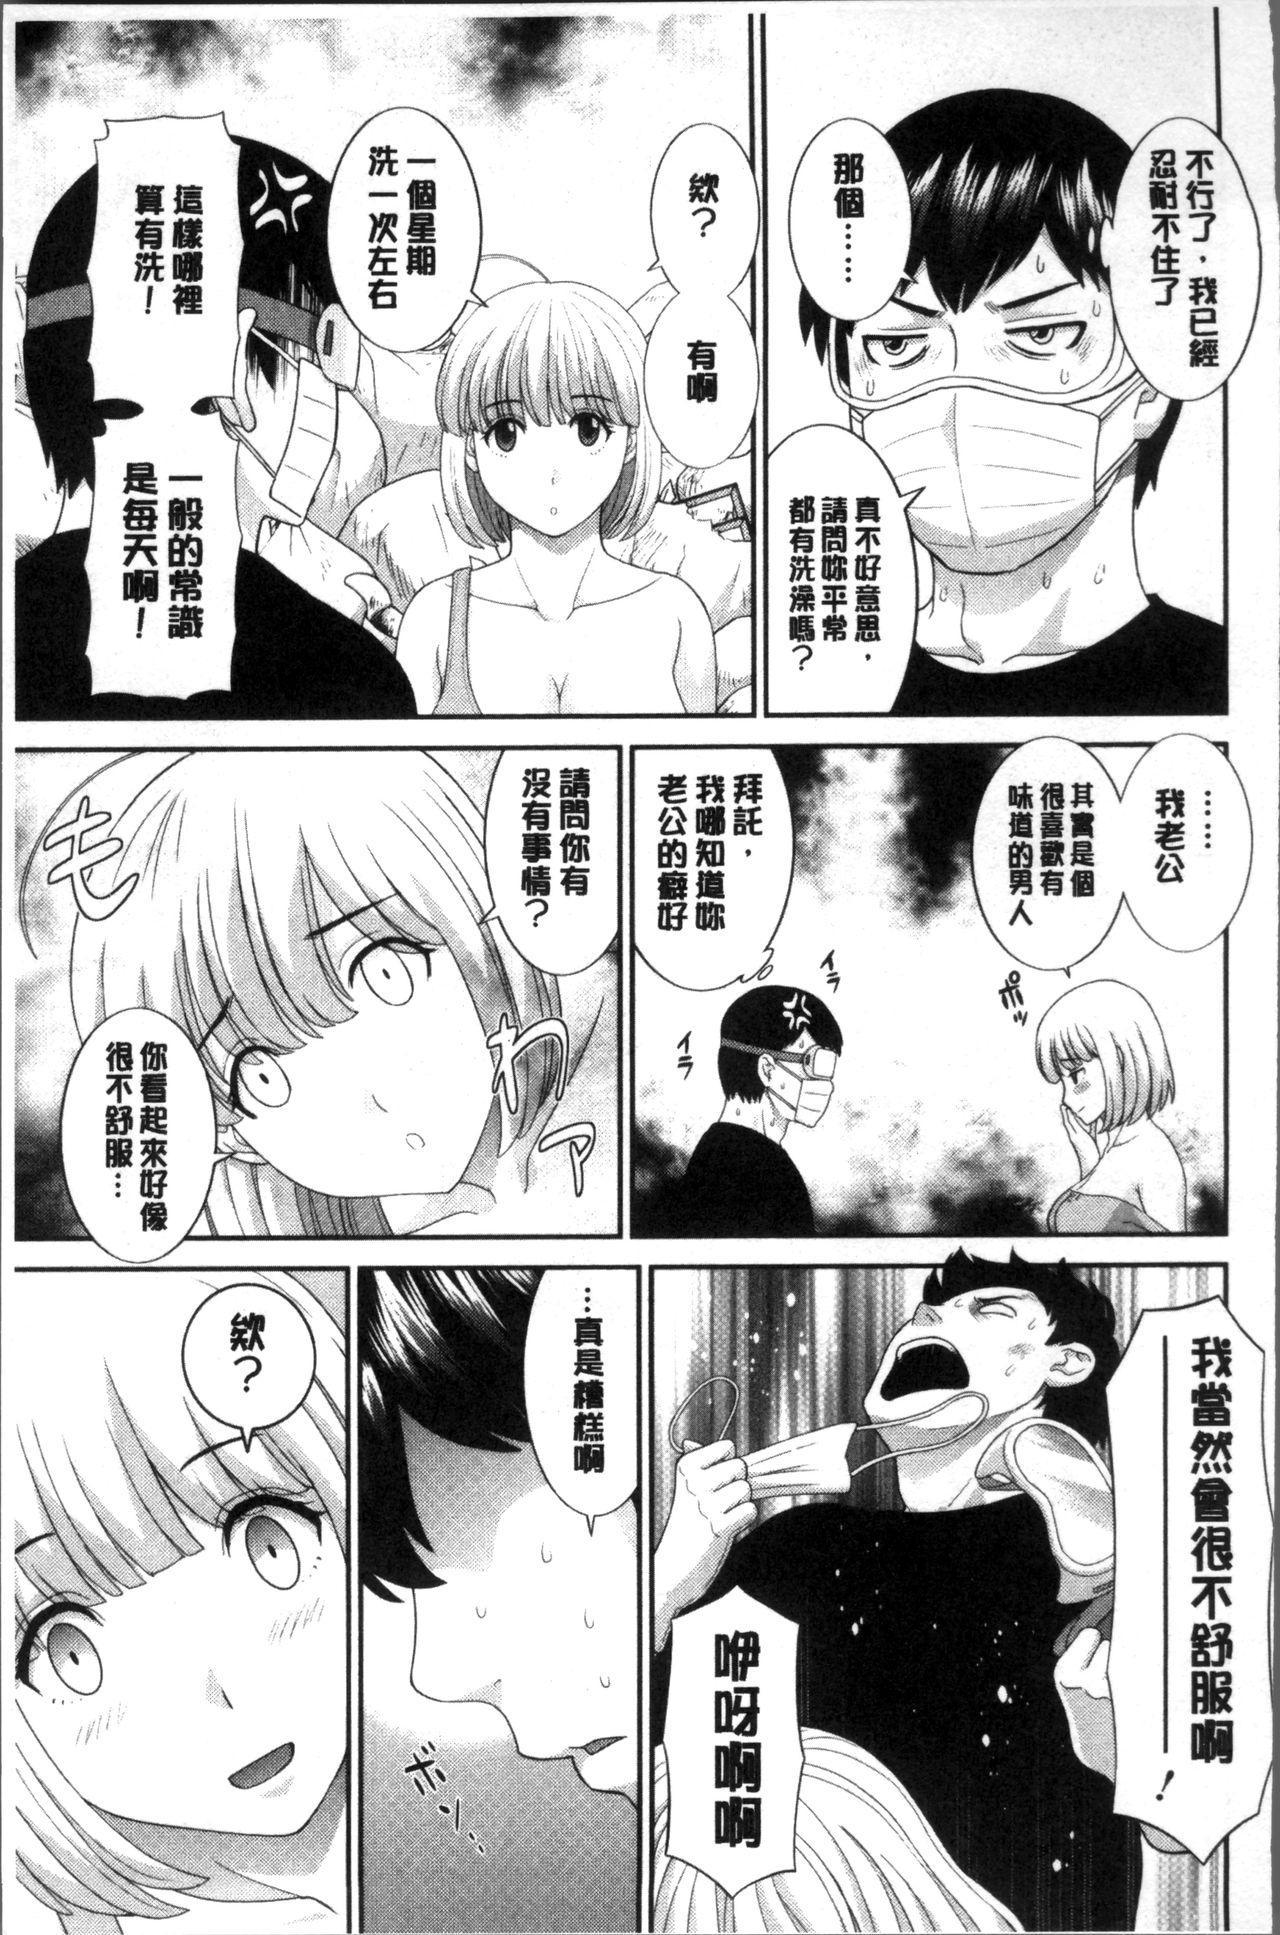 [Kawamori Misaki] Innyuu Shufu no Futei Ganbou - Oku-san to Kanojo to 2 | 淫乳主婦的不貞願望 和人妻也和女友❤2 [Chinese] 48